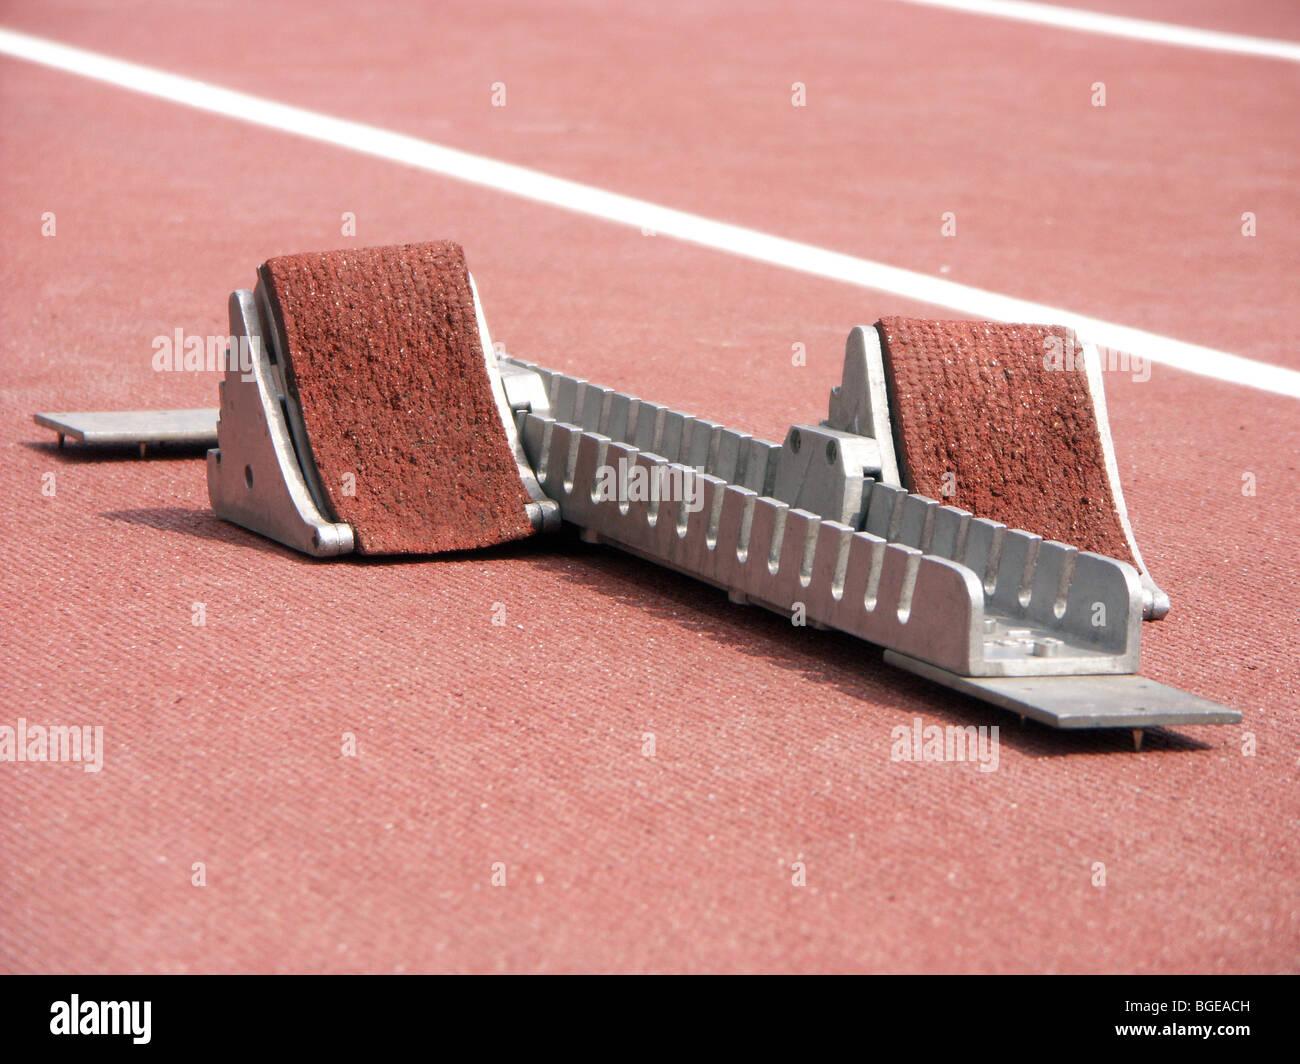 Shot of starting blocks on racing track - Stock Image